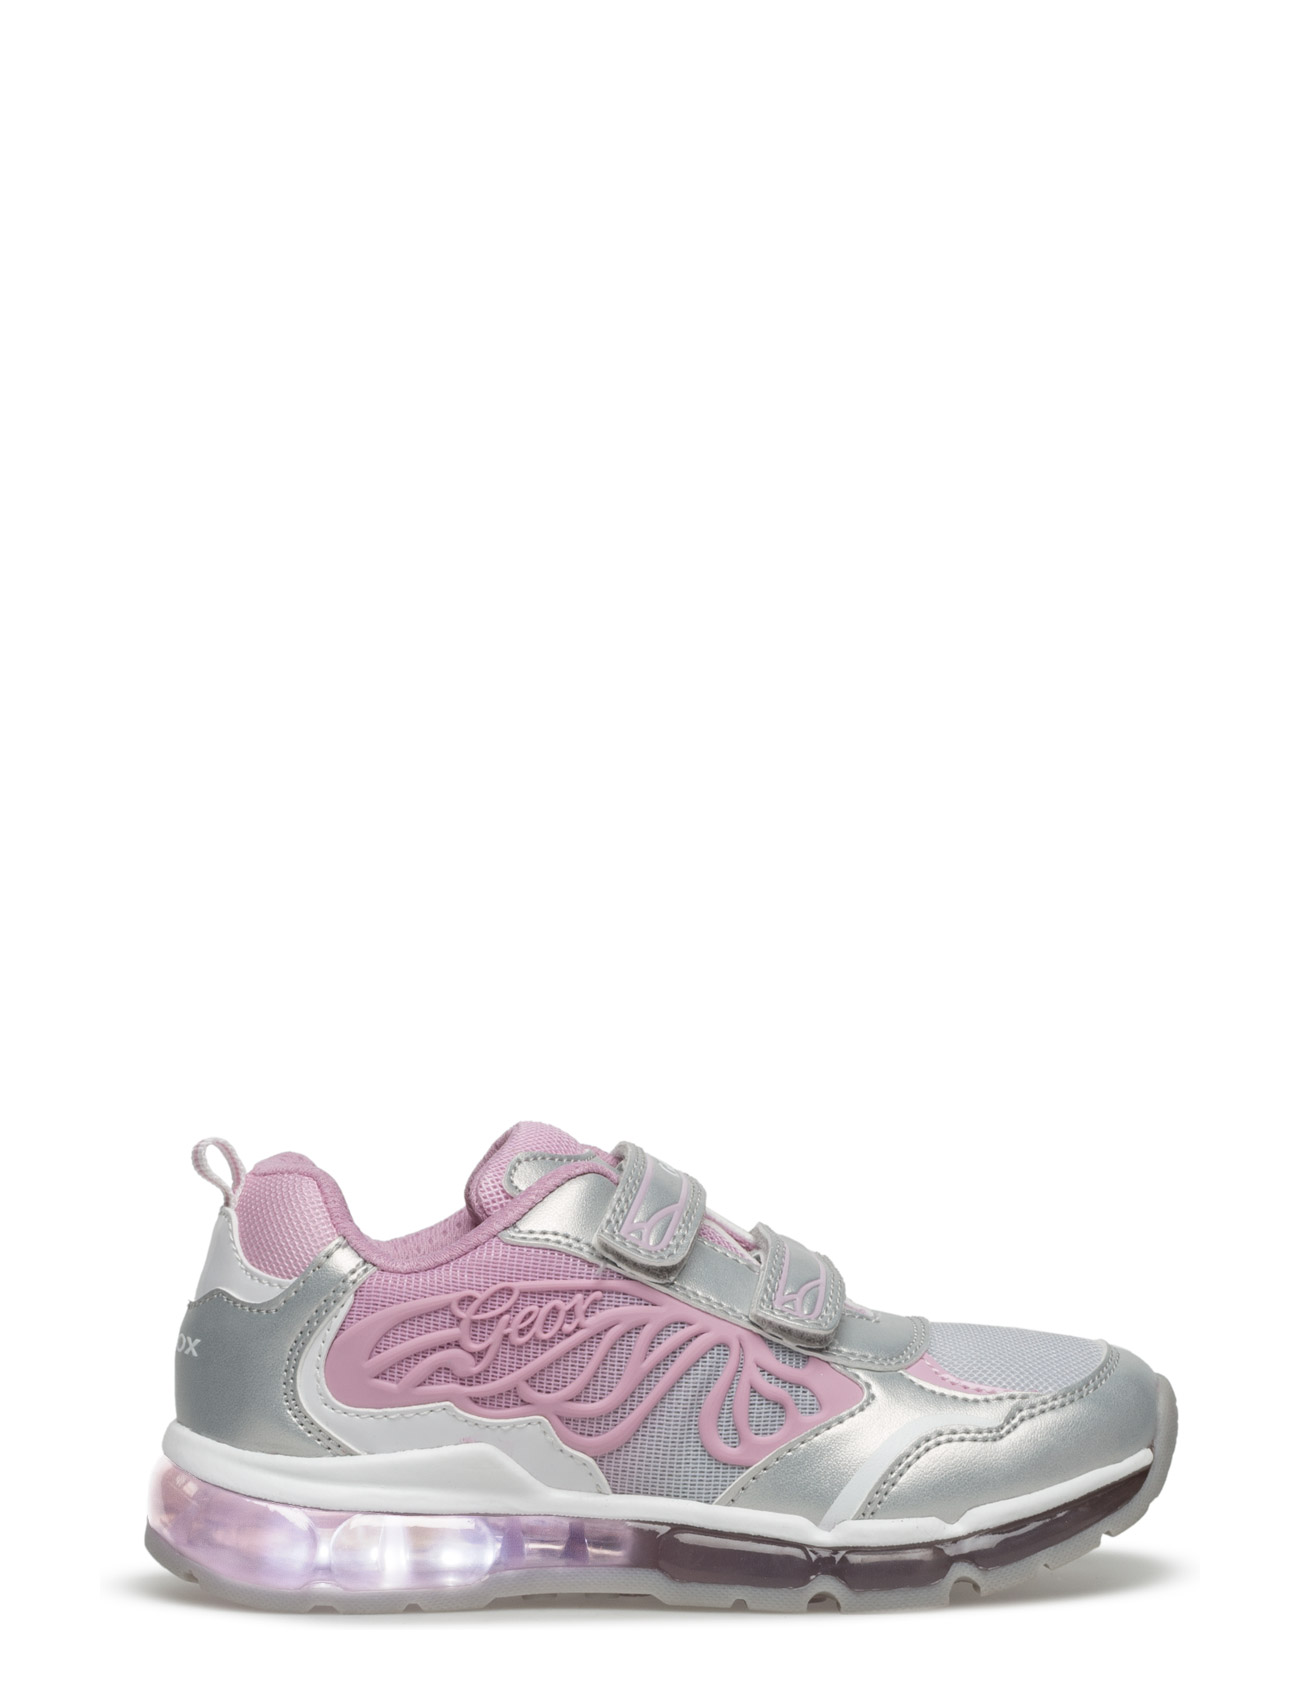 J Android Girl GEOX Sko & Sneakers til Børn i